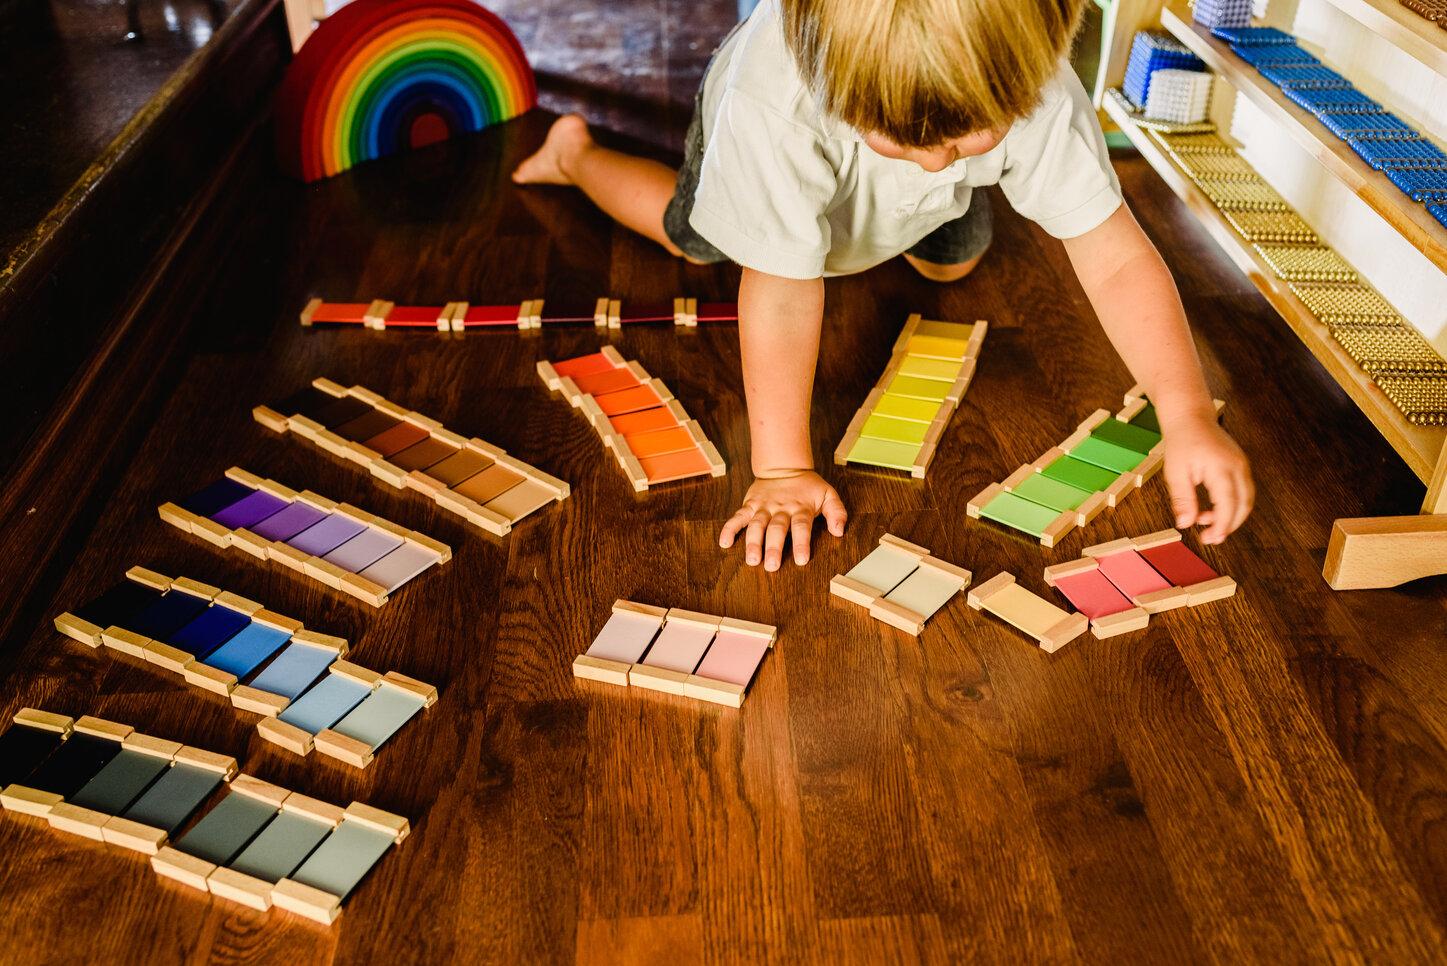 Montessori learning material